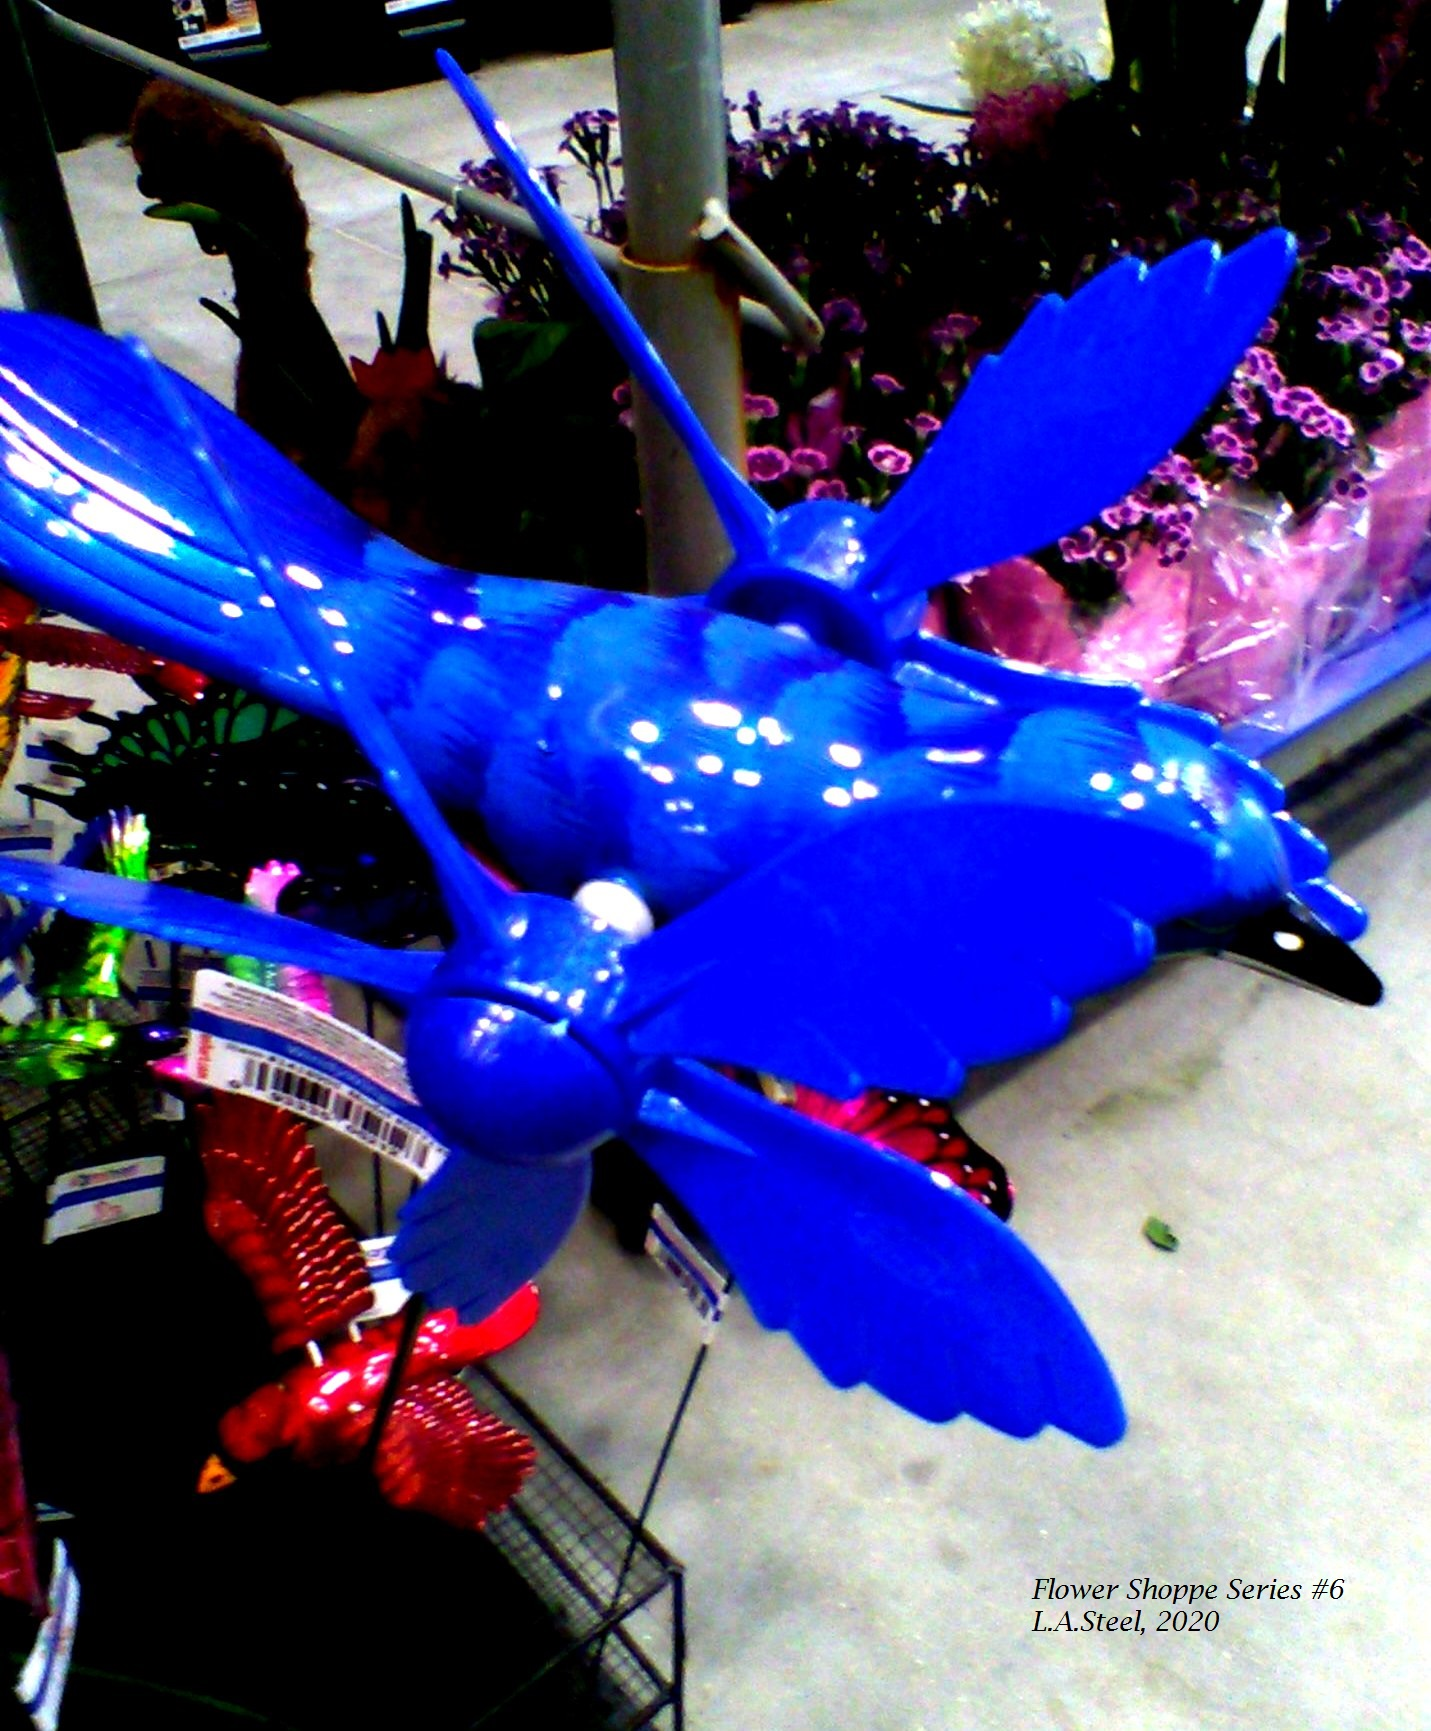 flower shoppe series #6 3 2020